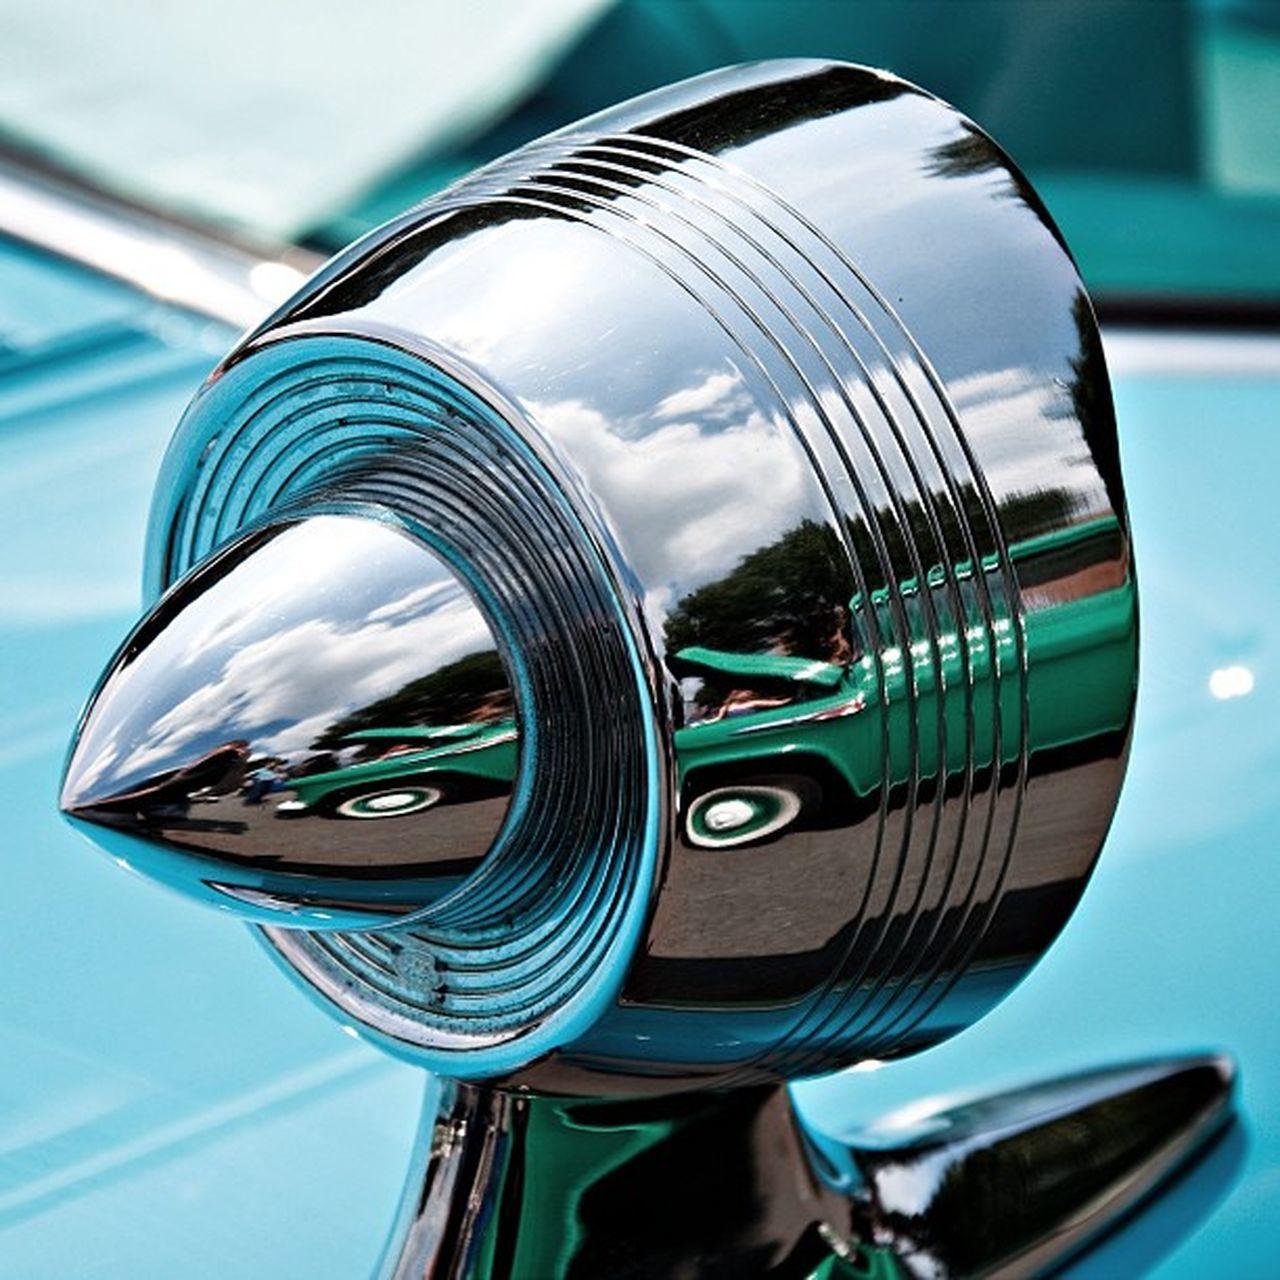 Reflections... Vintage Cars Mirror Rearviewmirror chrome reflections oldtimer rückspiegel chrom reflektionen alte autos d90 gimp